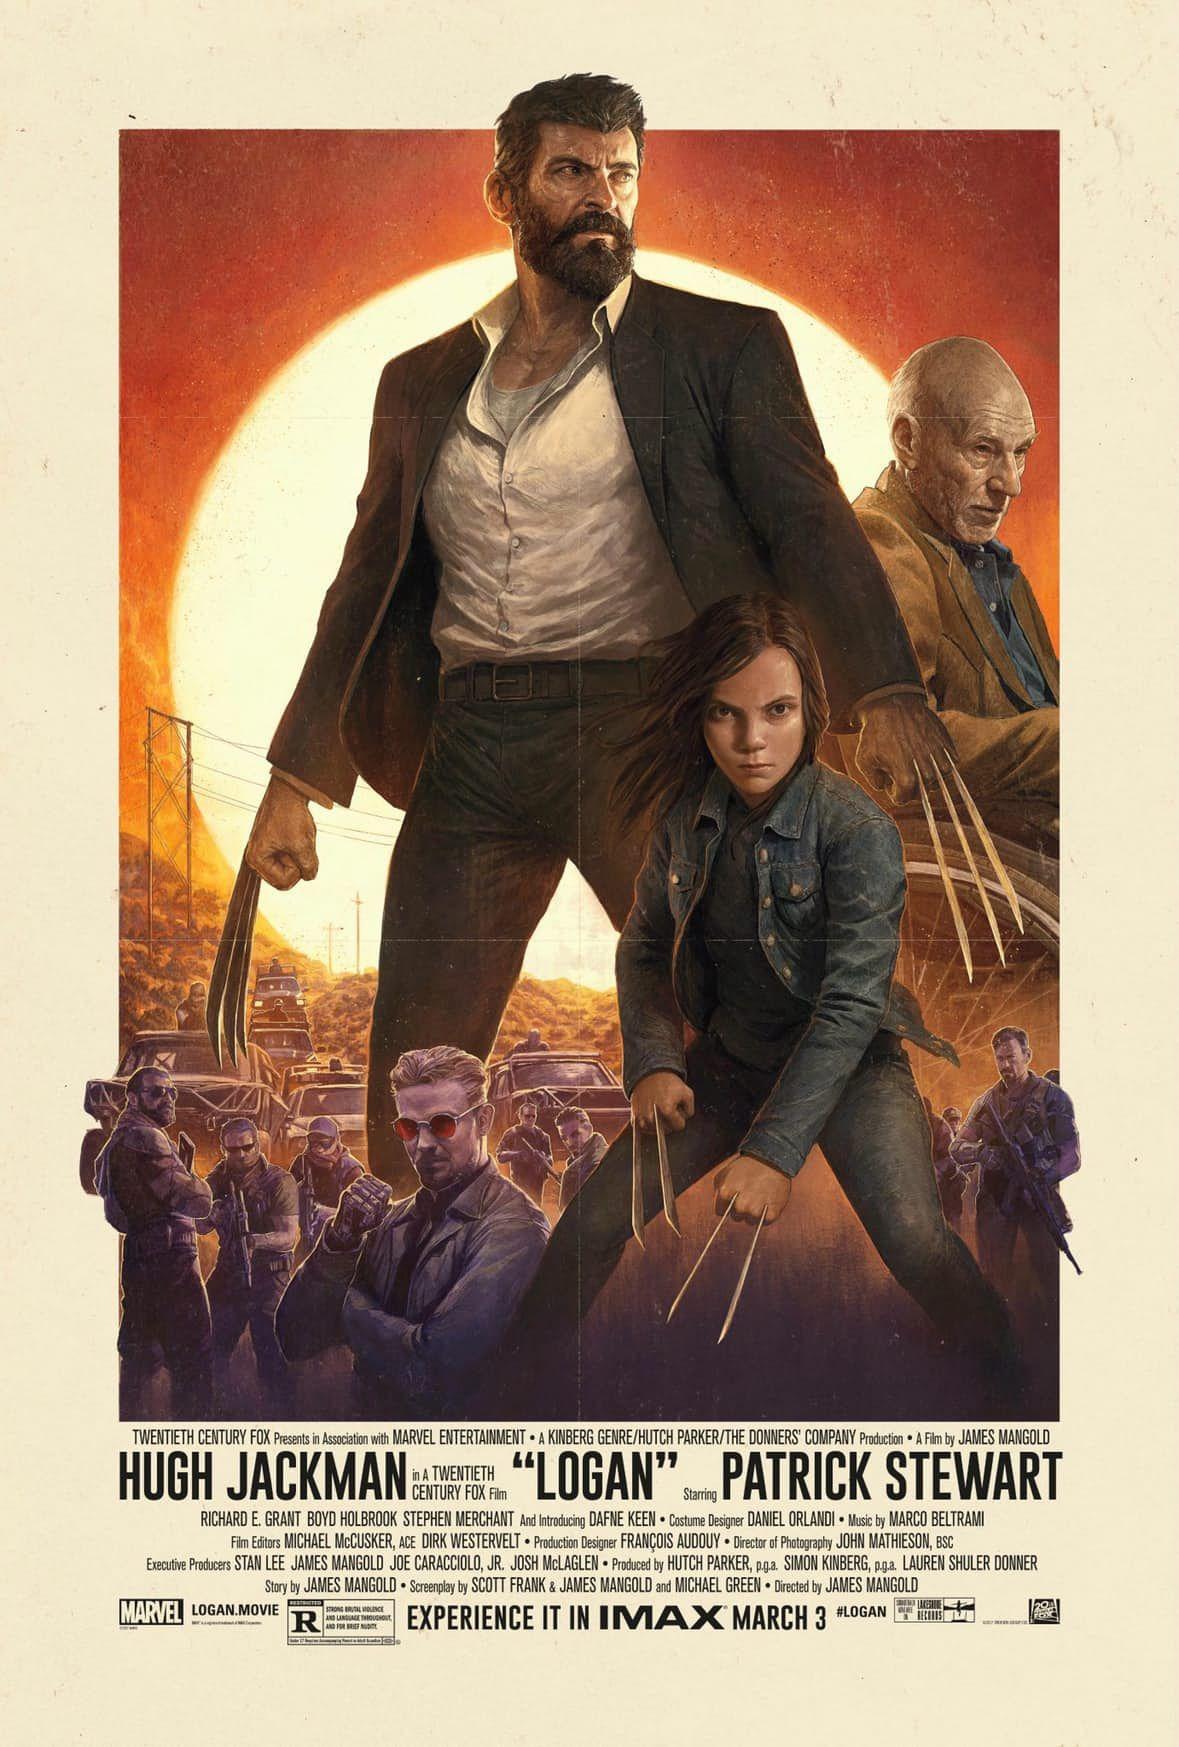 logan movie poster imax (1179×1747)